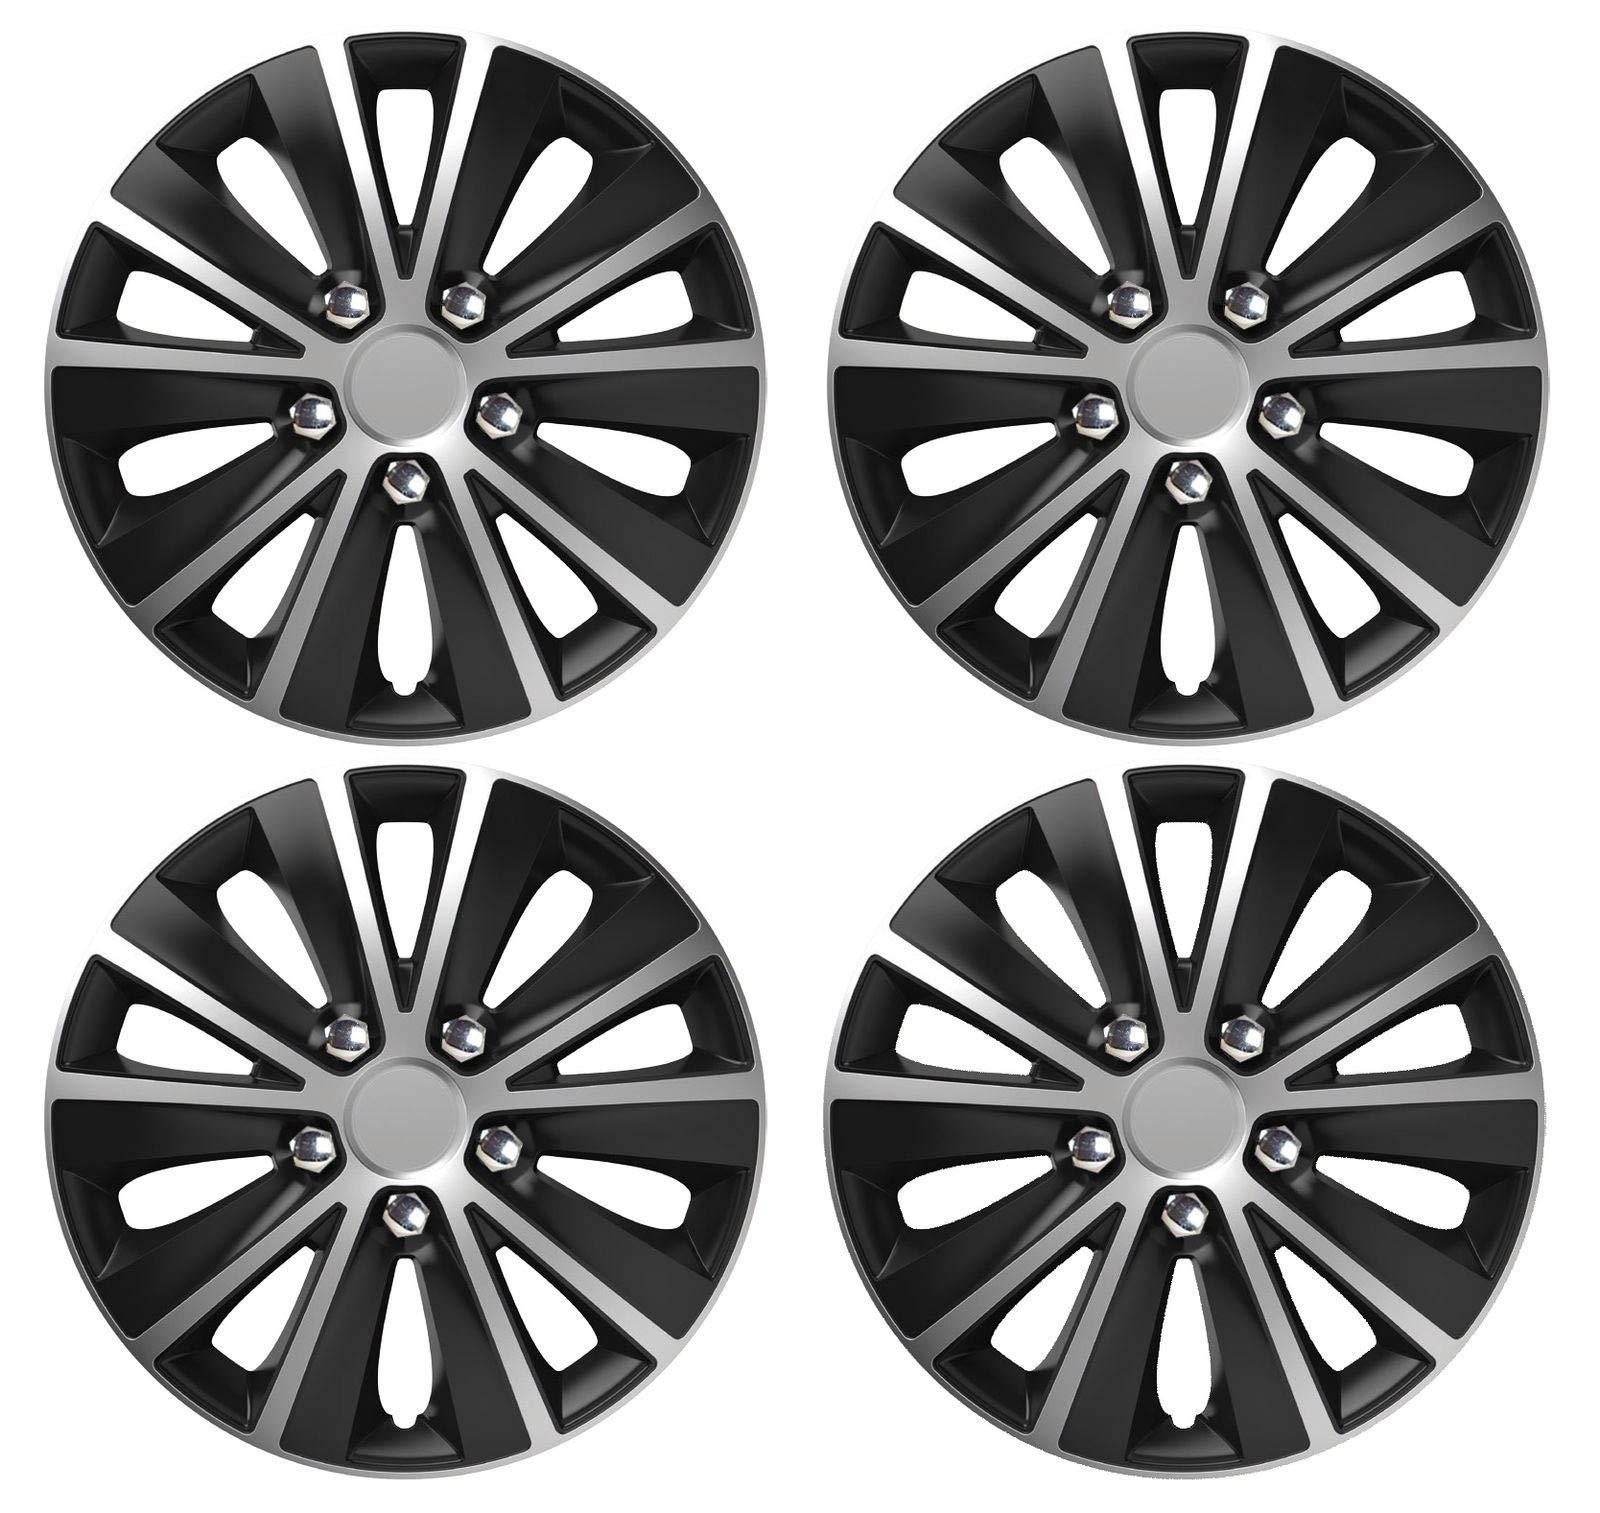 UKB4C Set of 4 Trims//Hub Caps 13 Covers fits Vauxhall Corsa Tigra Agila